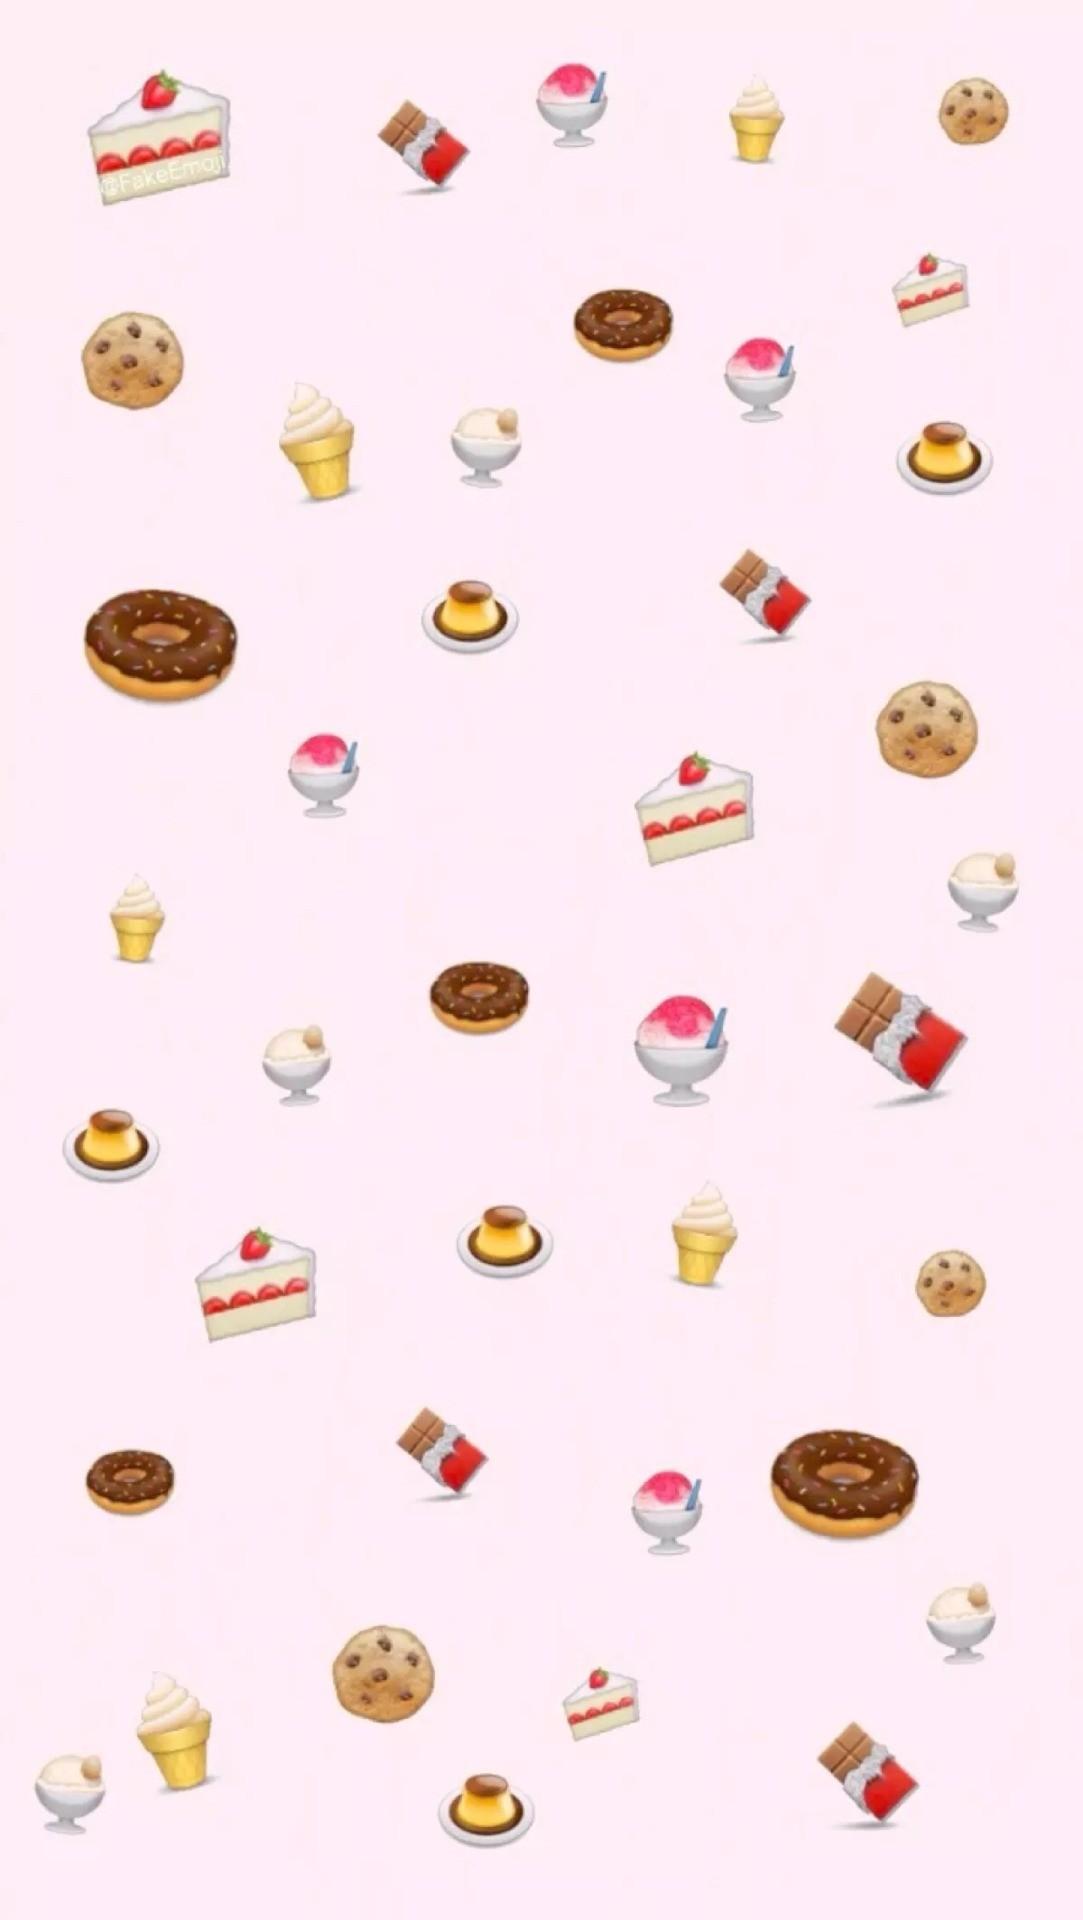 emoji wallpaper background full paper - photo #40